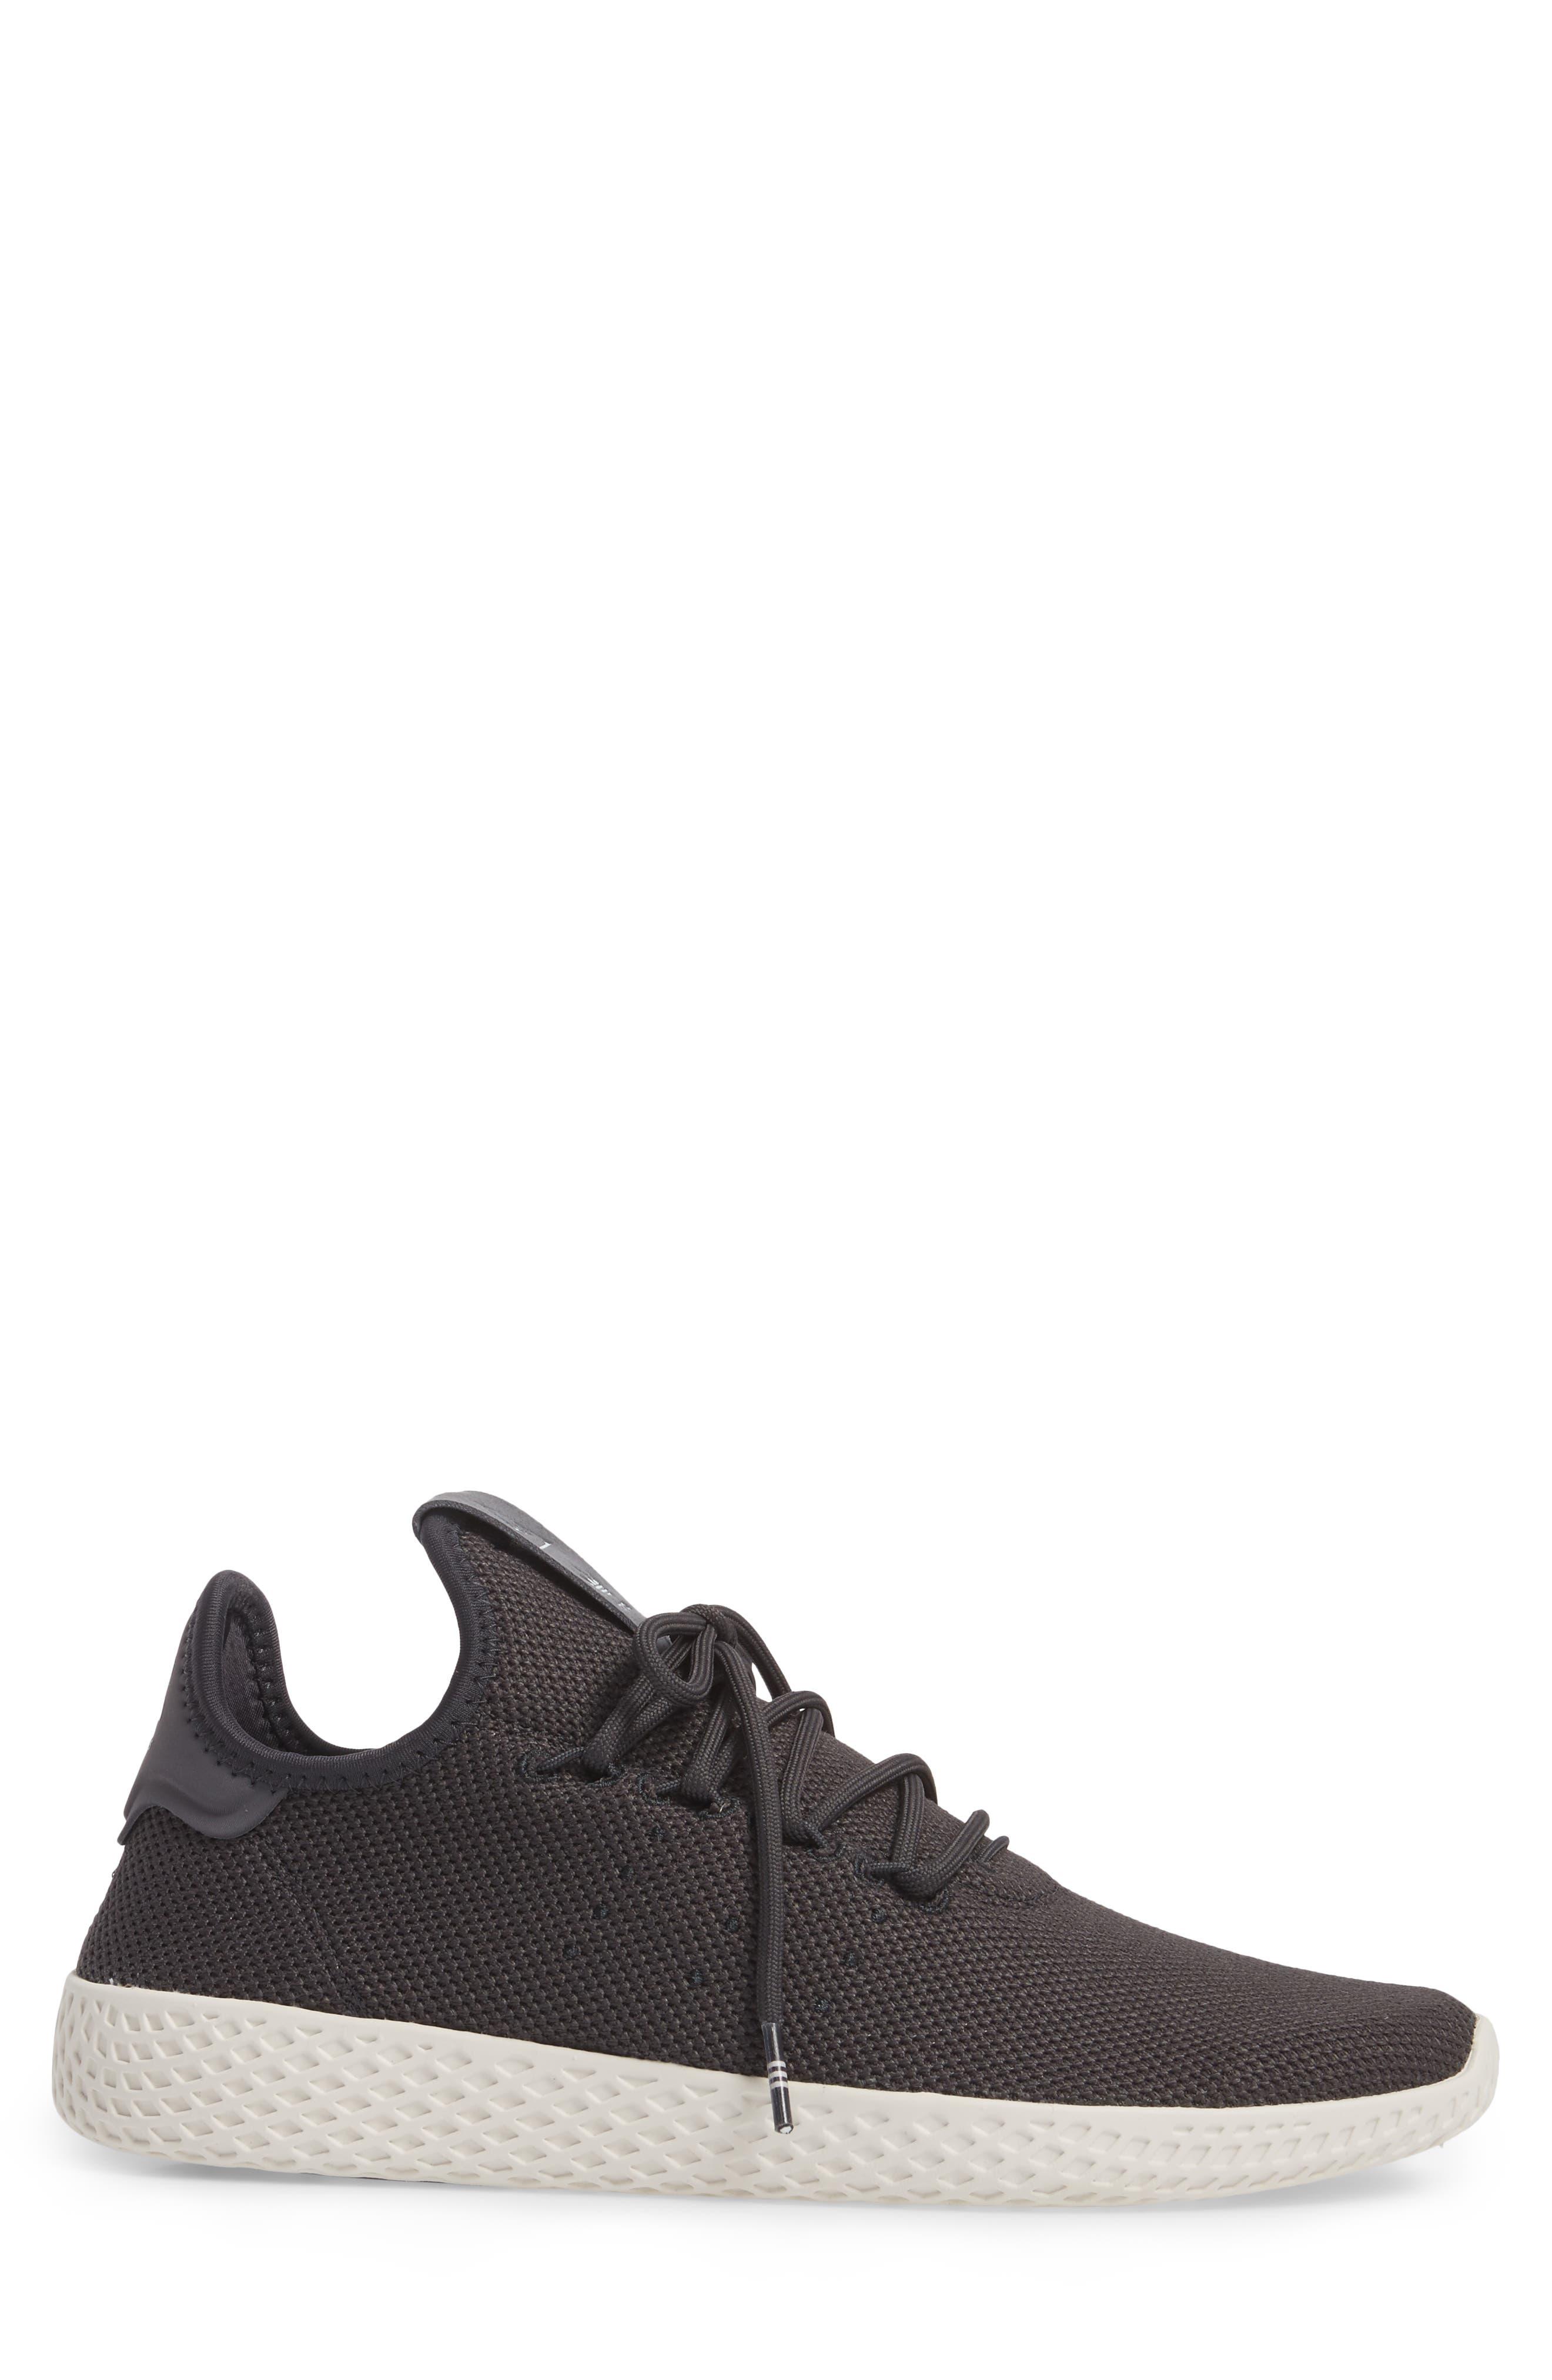 Pharrell Williams Tennis Hu Sneaker,                             Alternate thumbnail 3, color,                             Carbon / Carbon / Chalk White